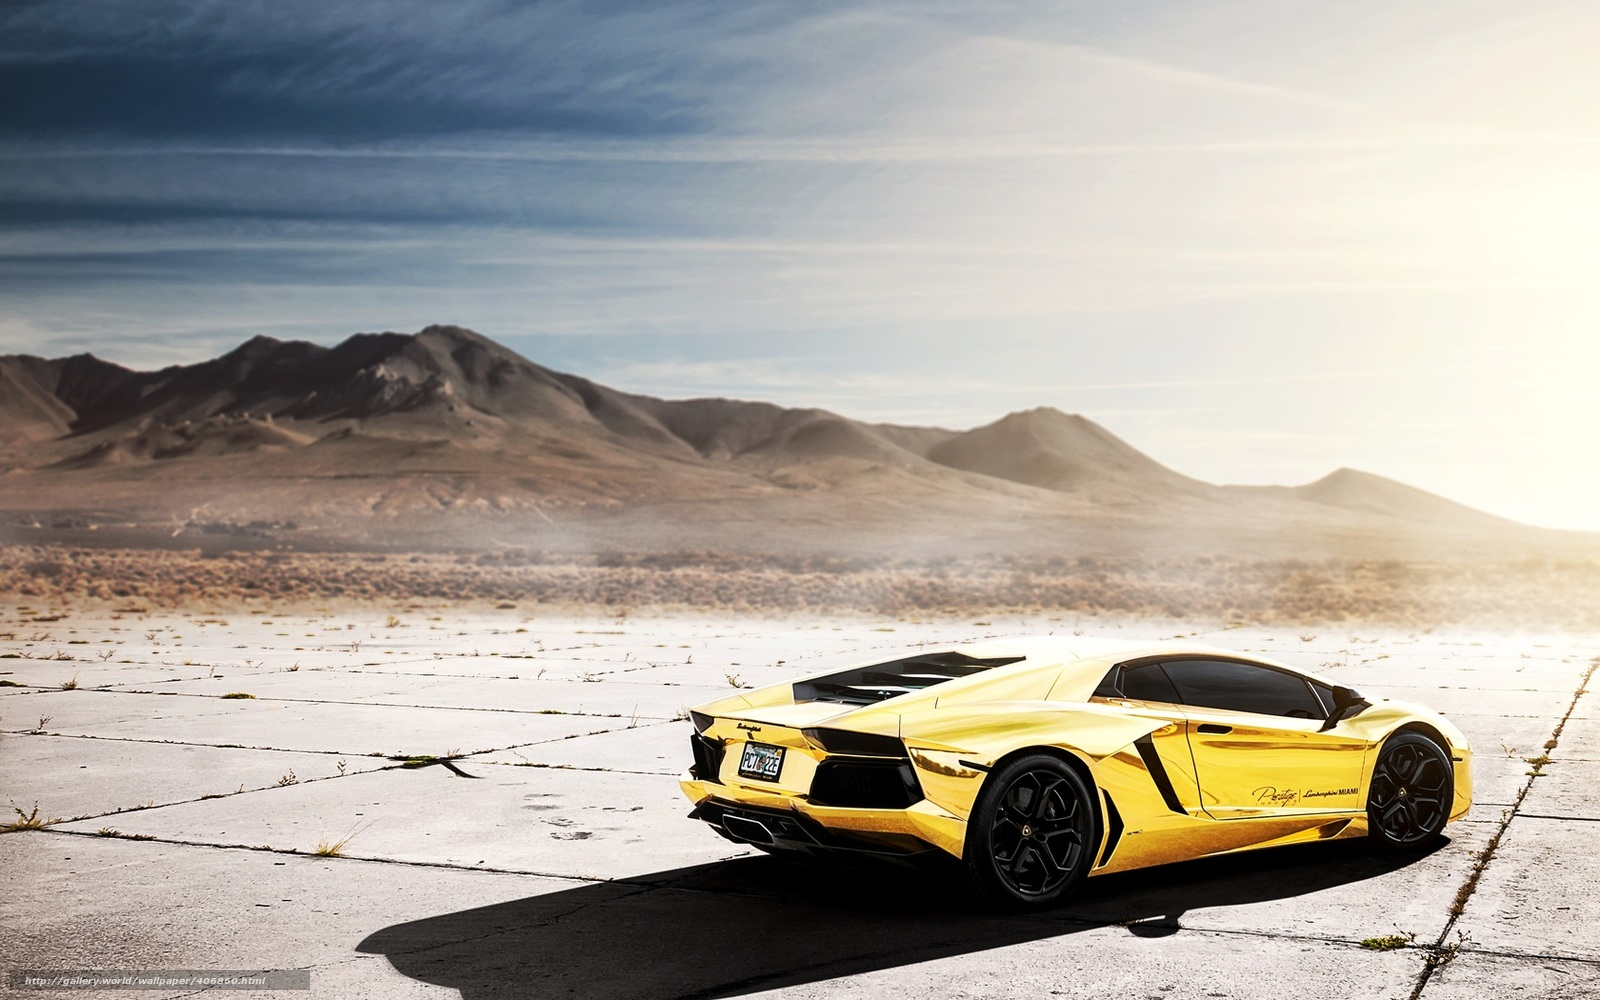 2014 Lamborghini Aventador further Lamborghini Gallardo 2015 Gold 2 besides 25 Hd Egzotik Ve Spor Araba Duvar Kagitlari together with 1286181 Lamborghini Configurator in addition Watch. on solid gold lamborghini huracan